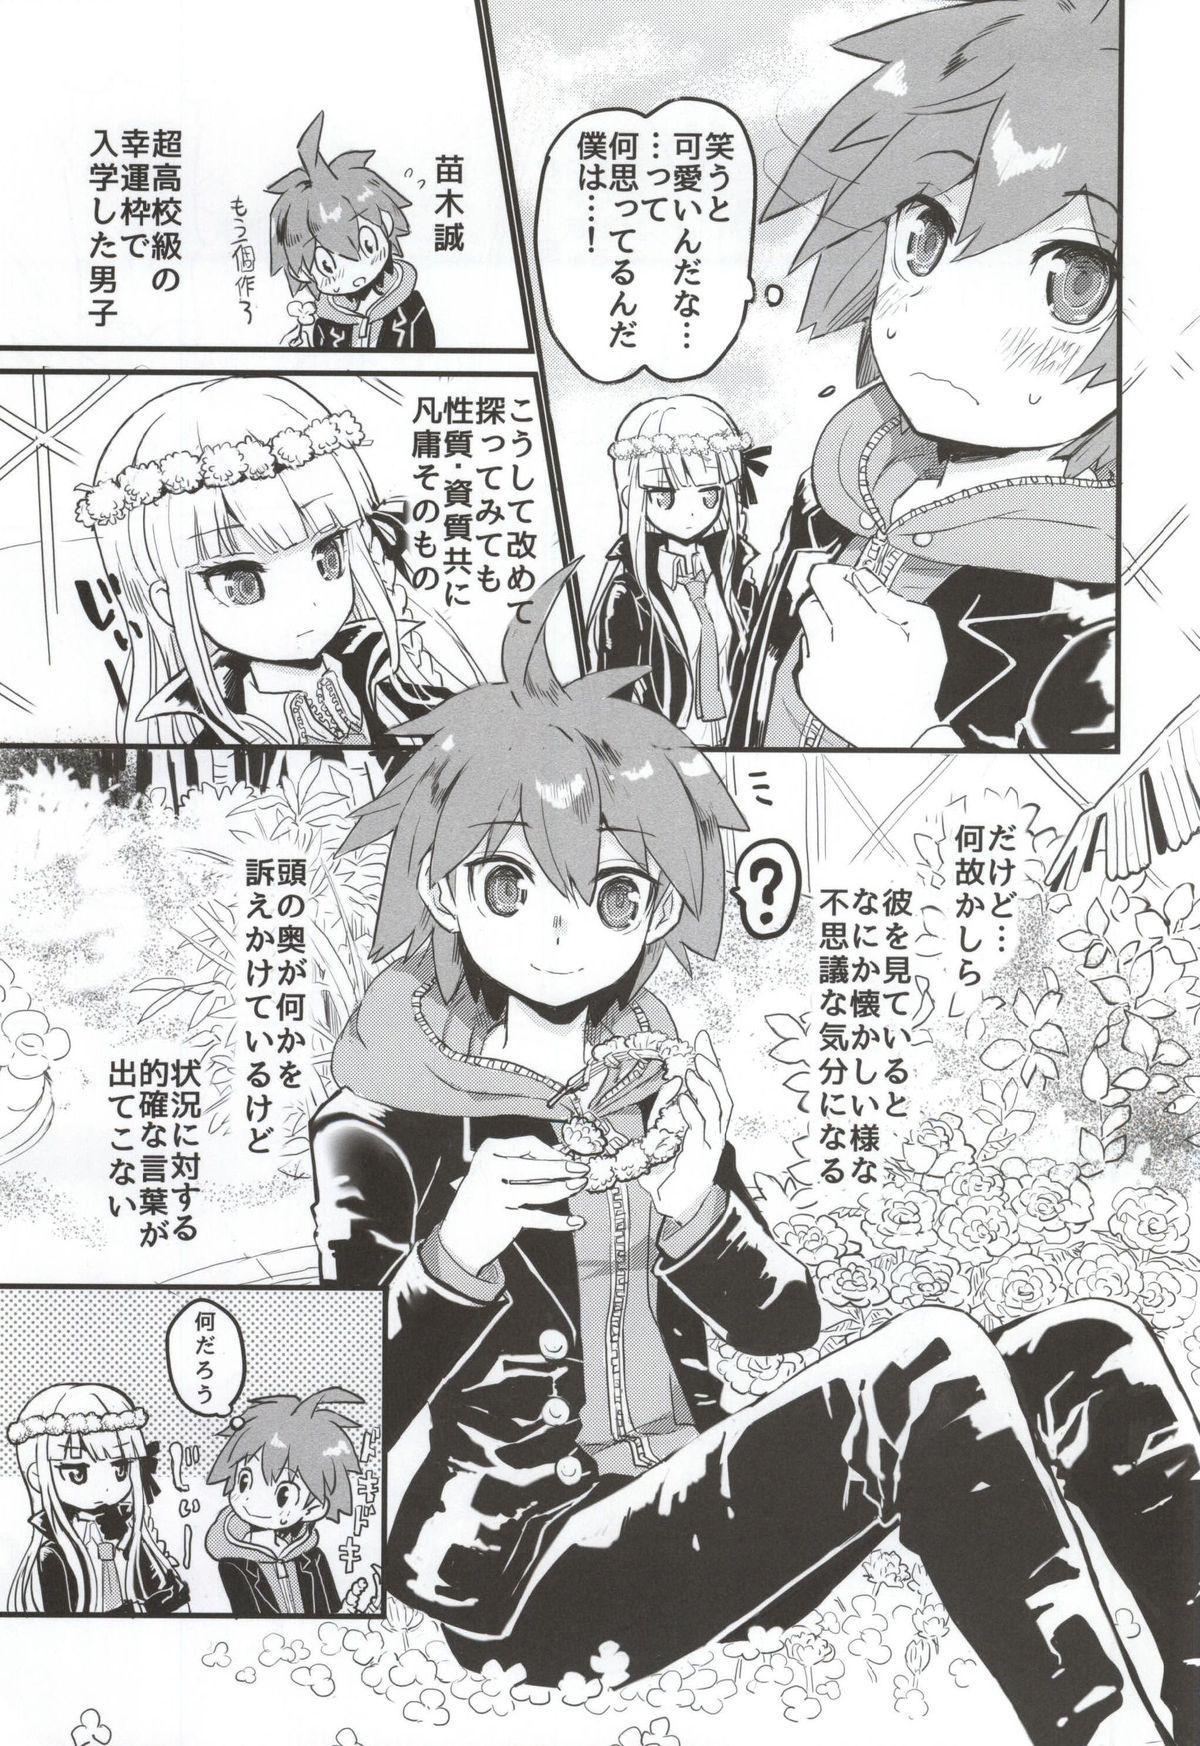 Kirigiri-san to Issho ni School Mode 5